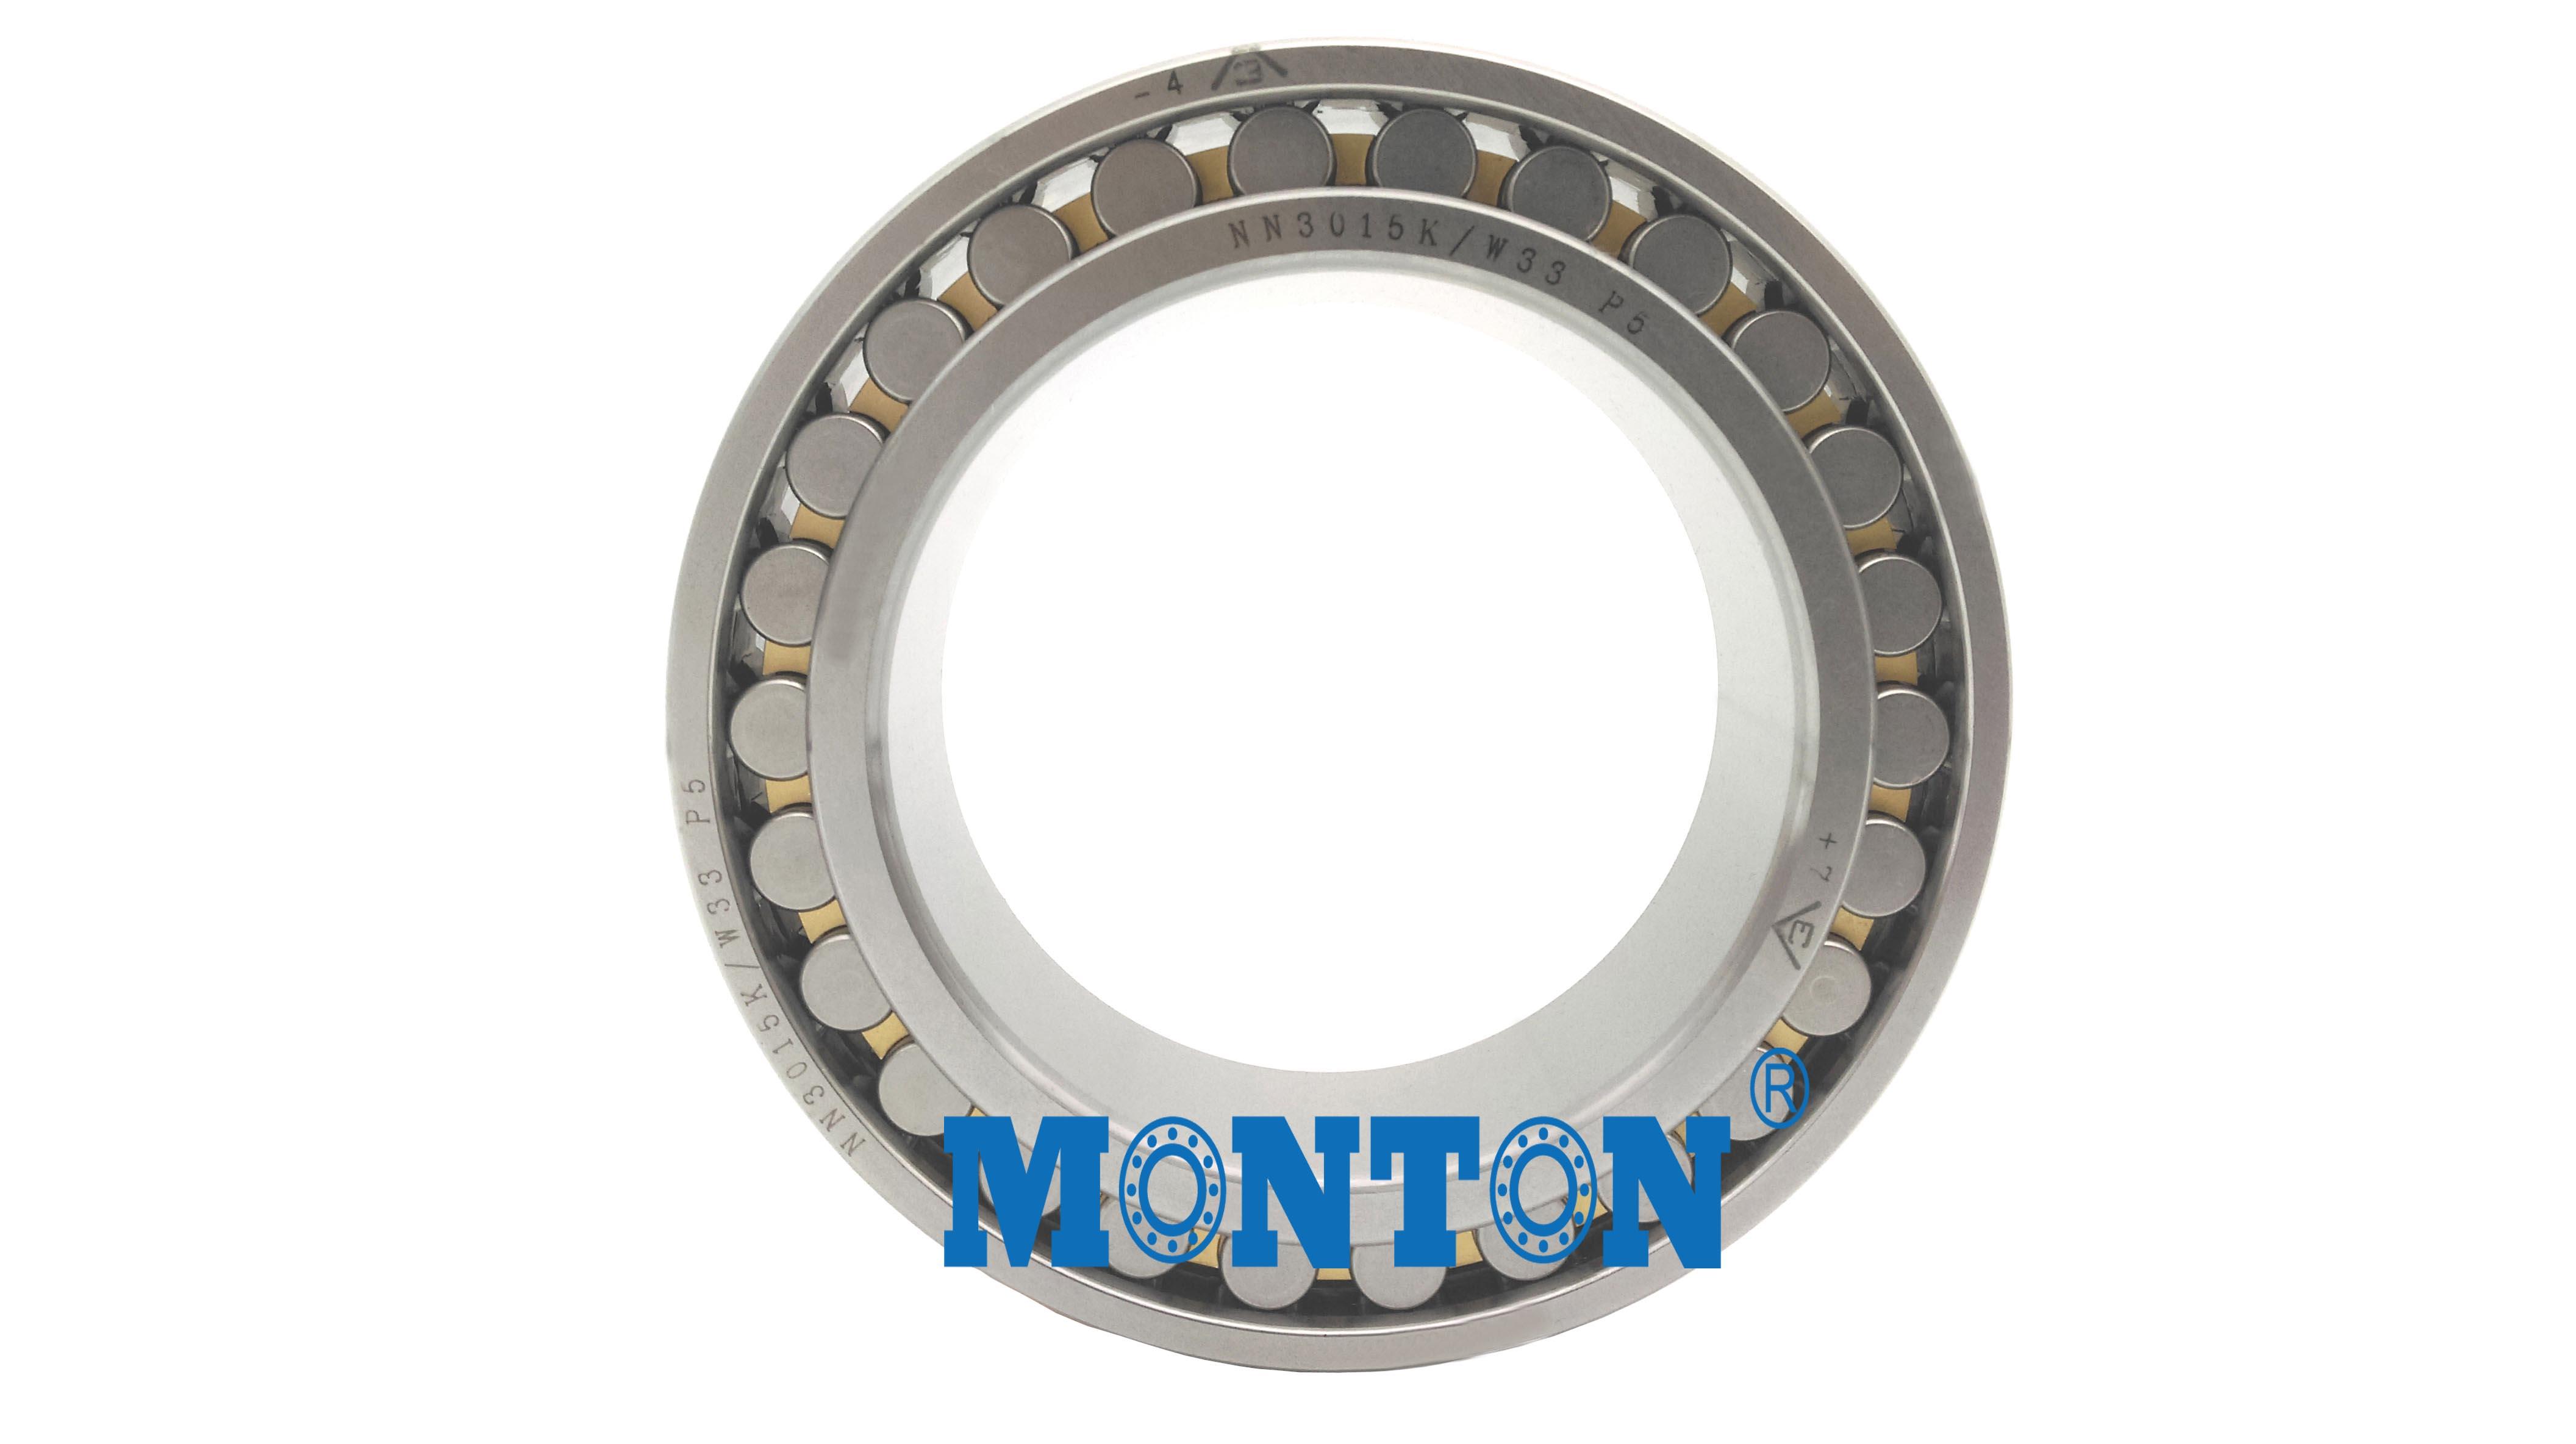 NN3015KW33/P5  Cylindrical Roller Bearings Machine Tool Spindle Bearings